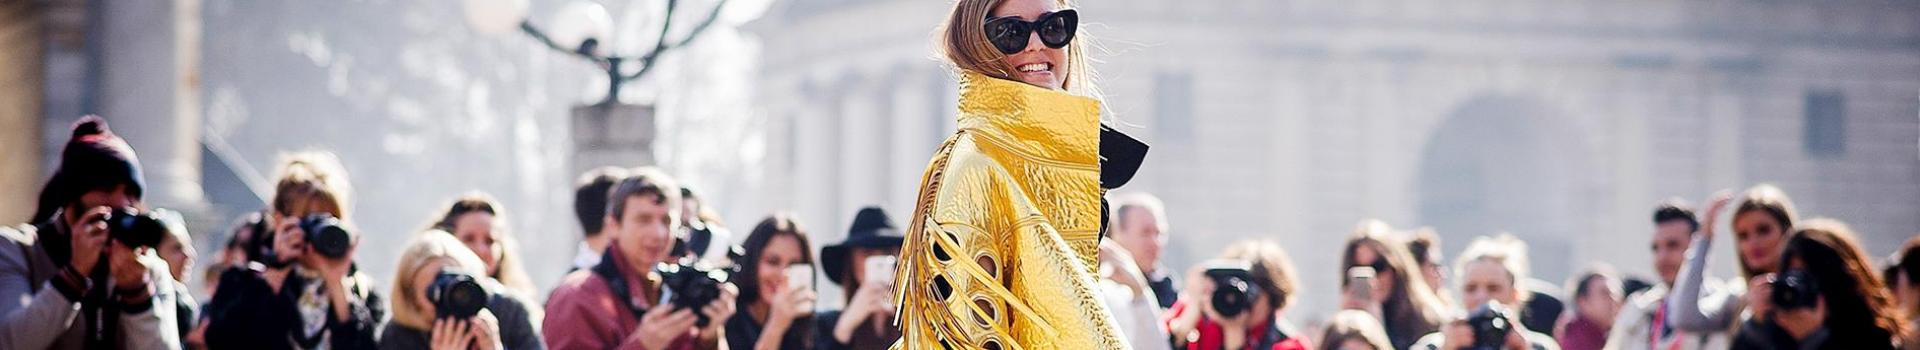 Chiara Ferragni blogueuse mode